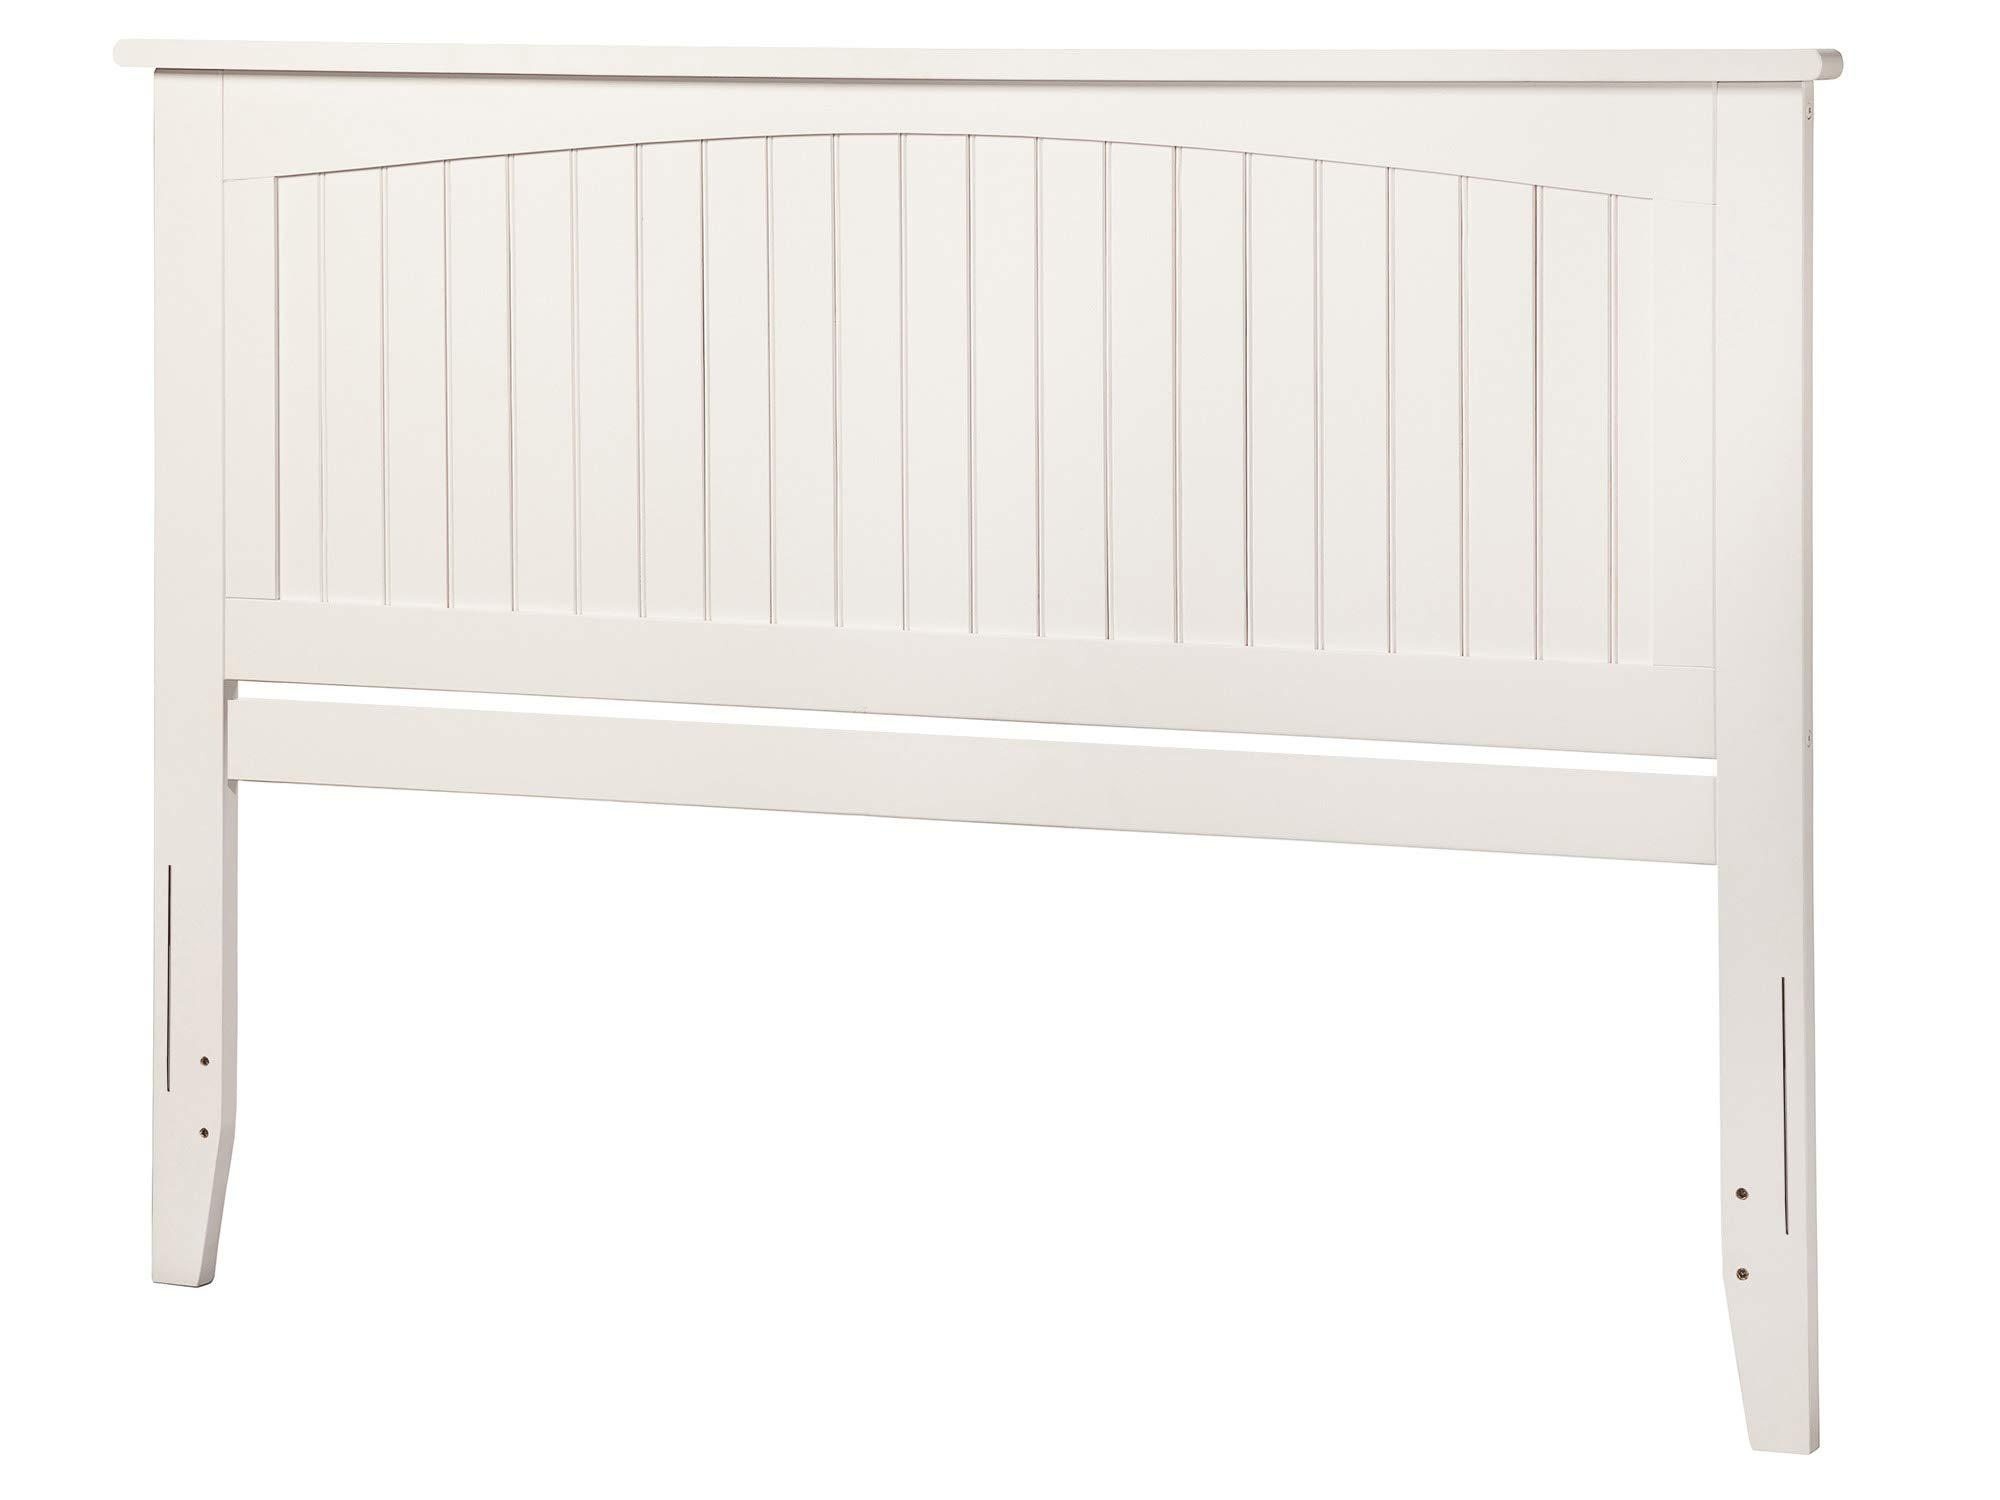 Atlantic Furniture AR282852 Nantucket Headboard, King, White